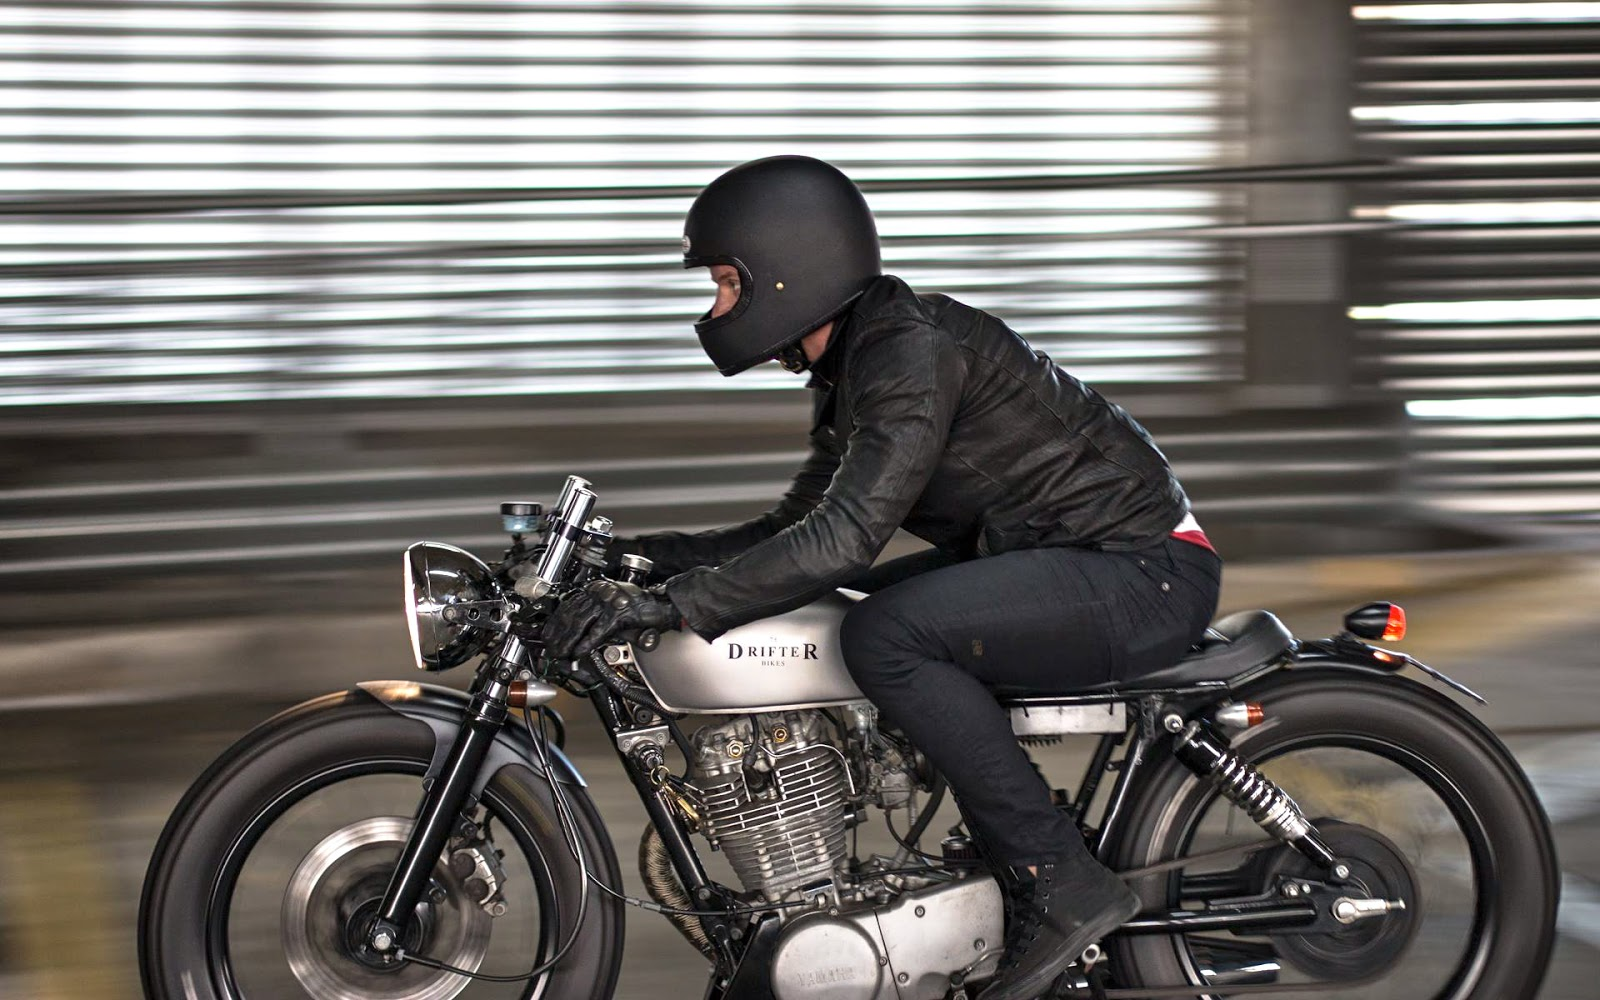 sr400drifter bikes | inazuma café racer